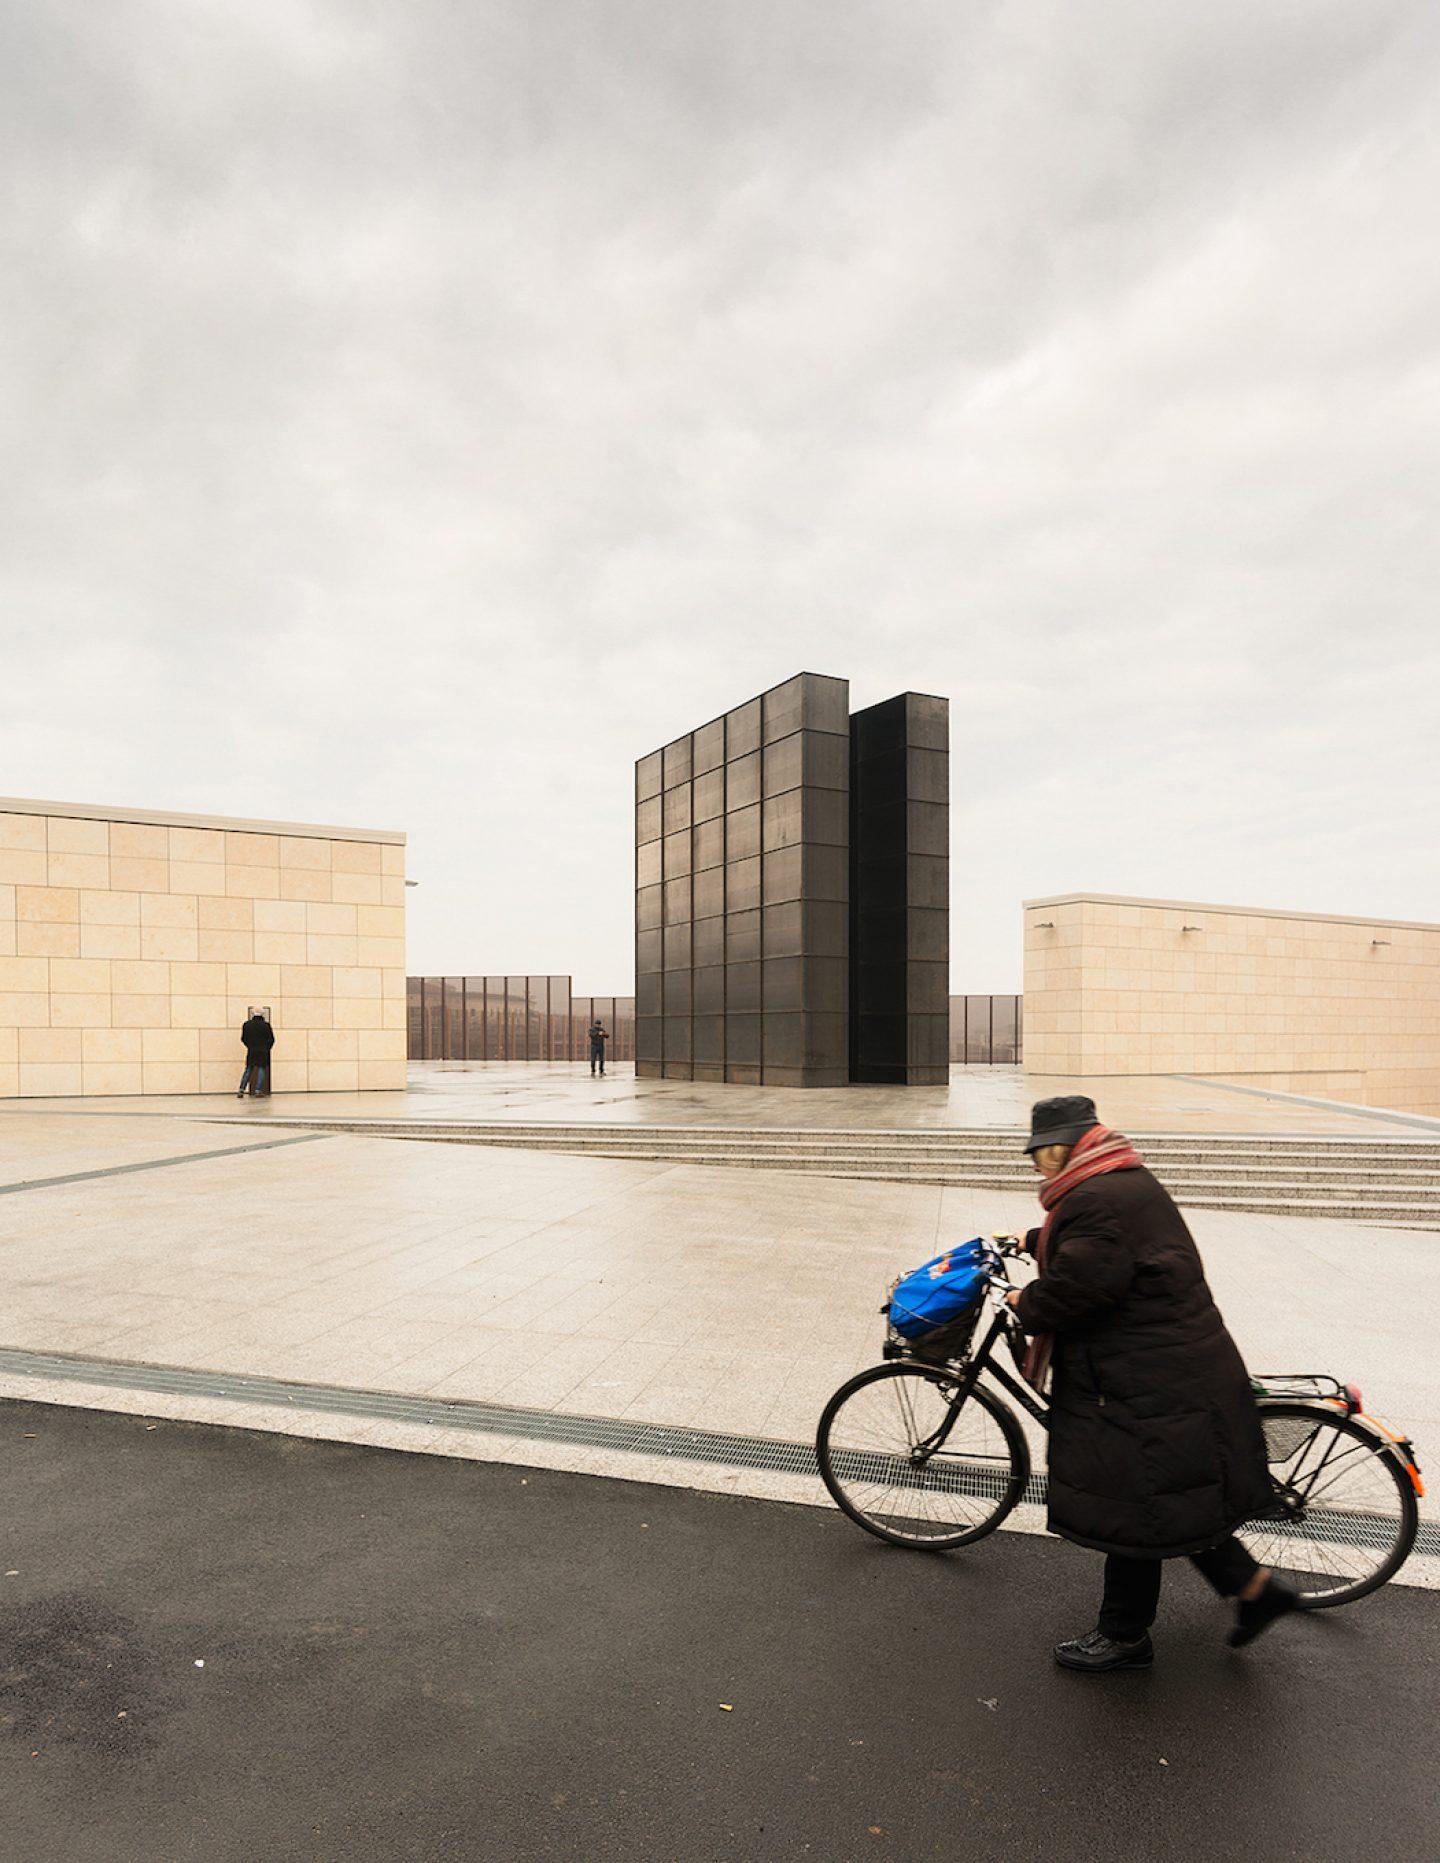 03_Bologna Shoah Memorial ©Simone Bossi